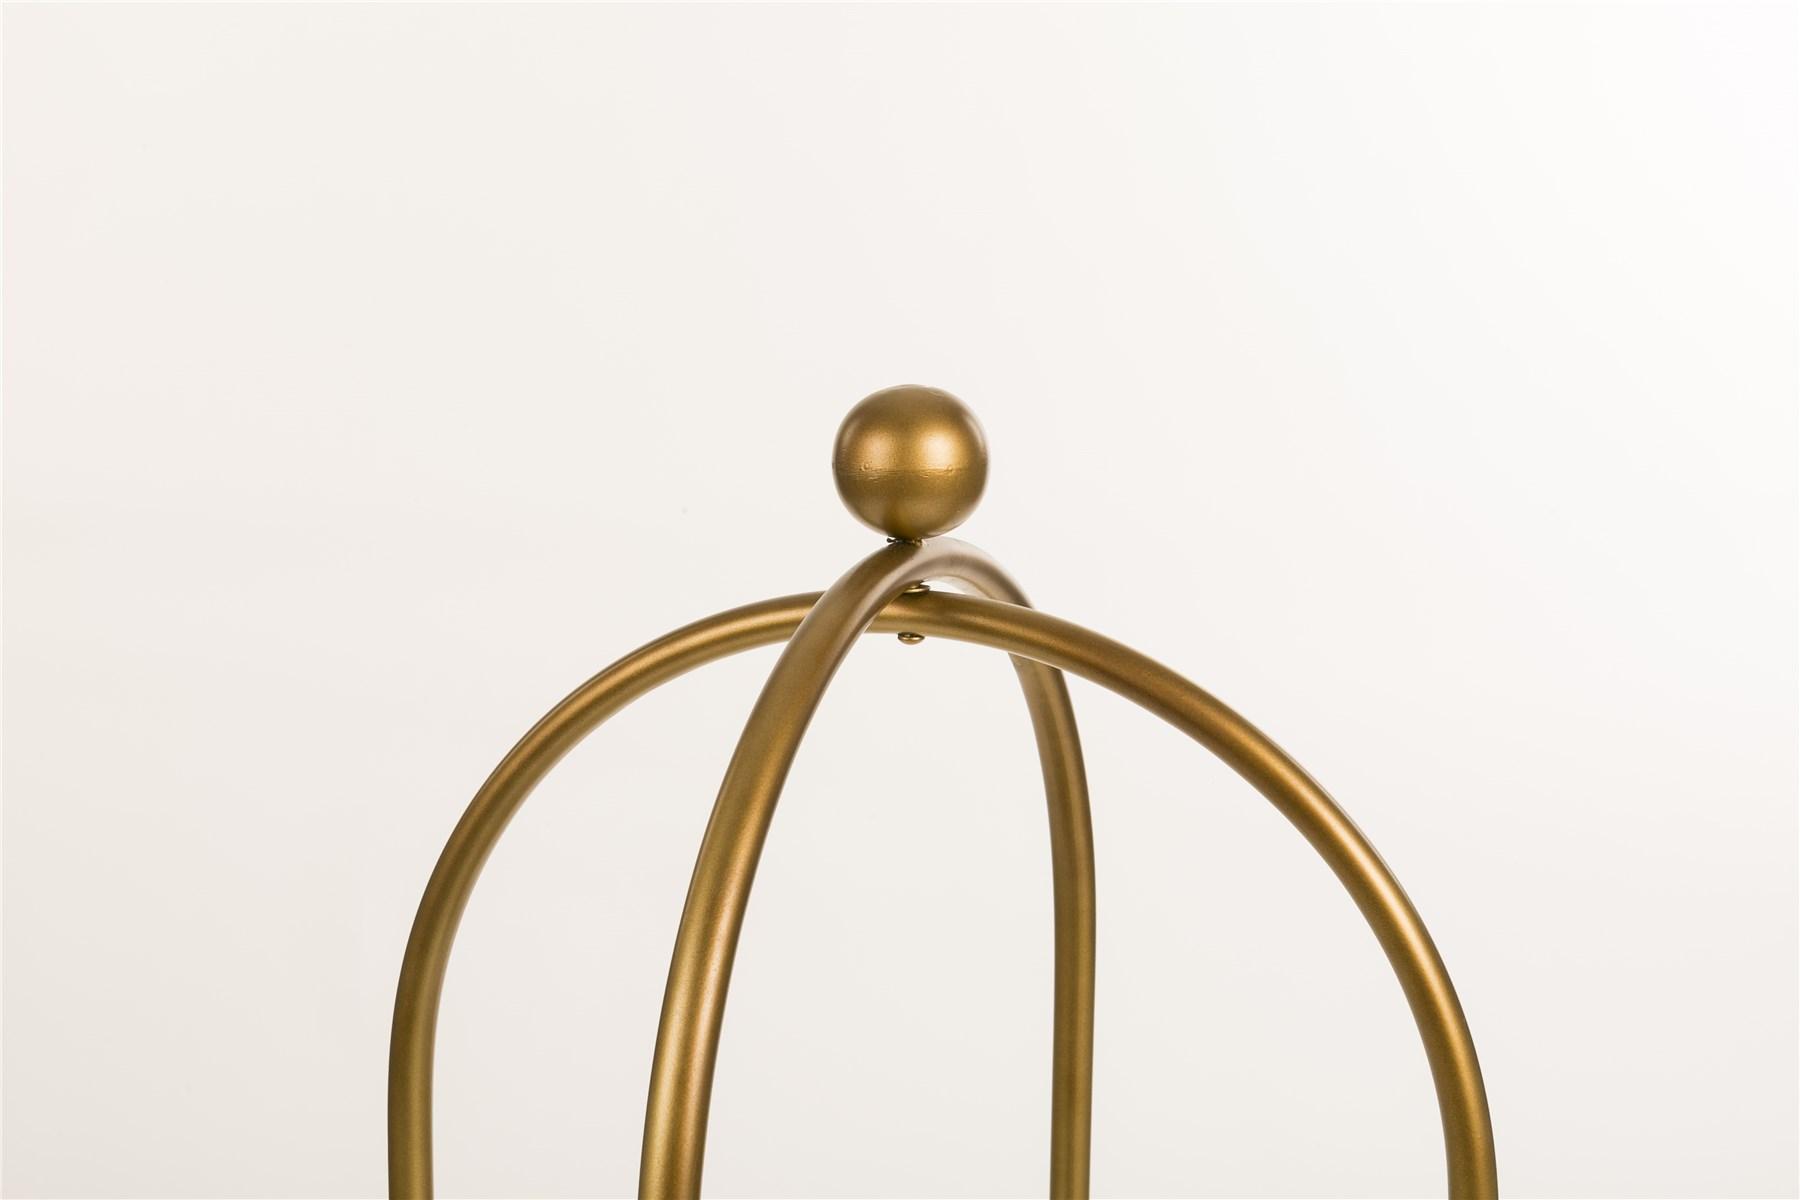 28259-estanteria-forja-oro-cristal-1.jpg